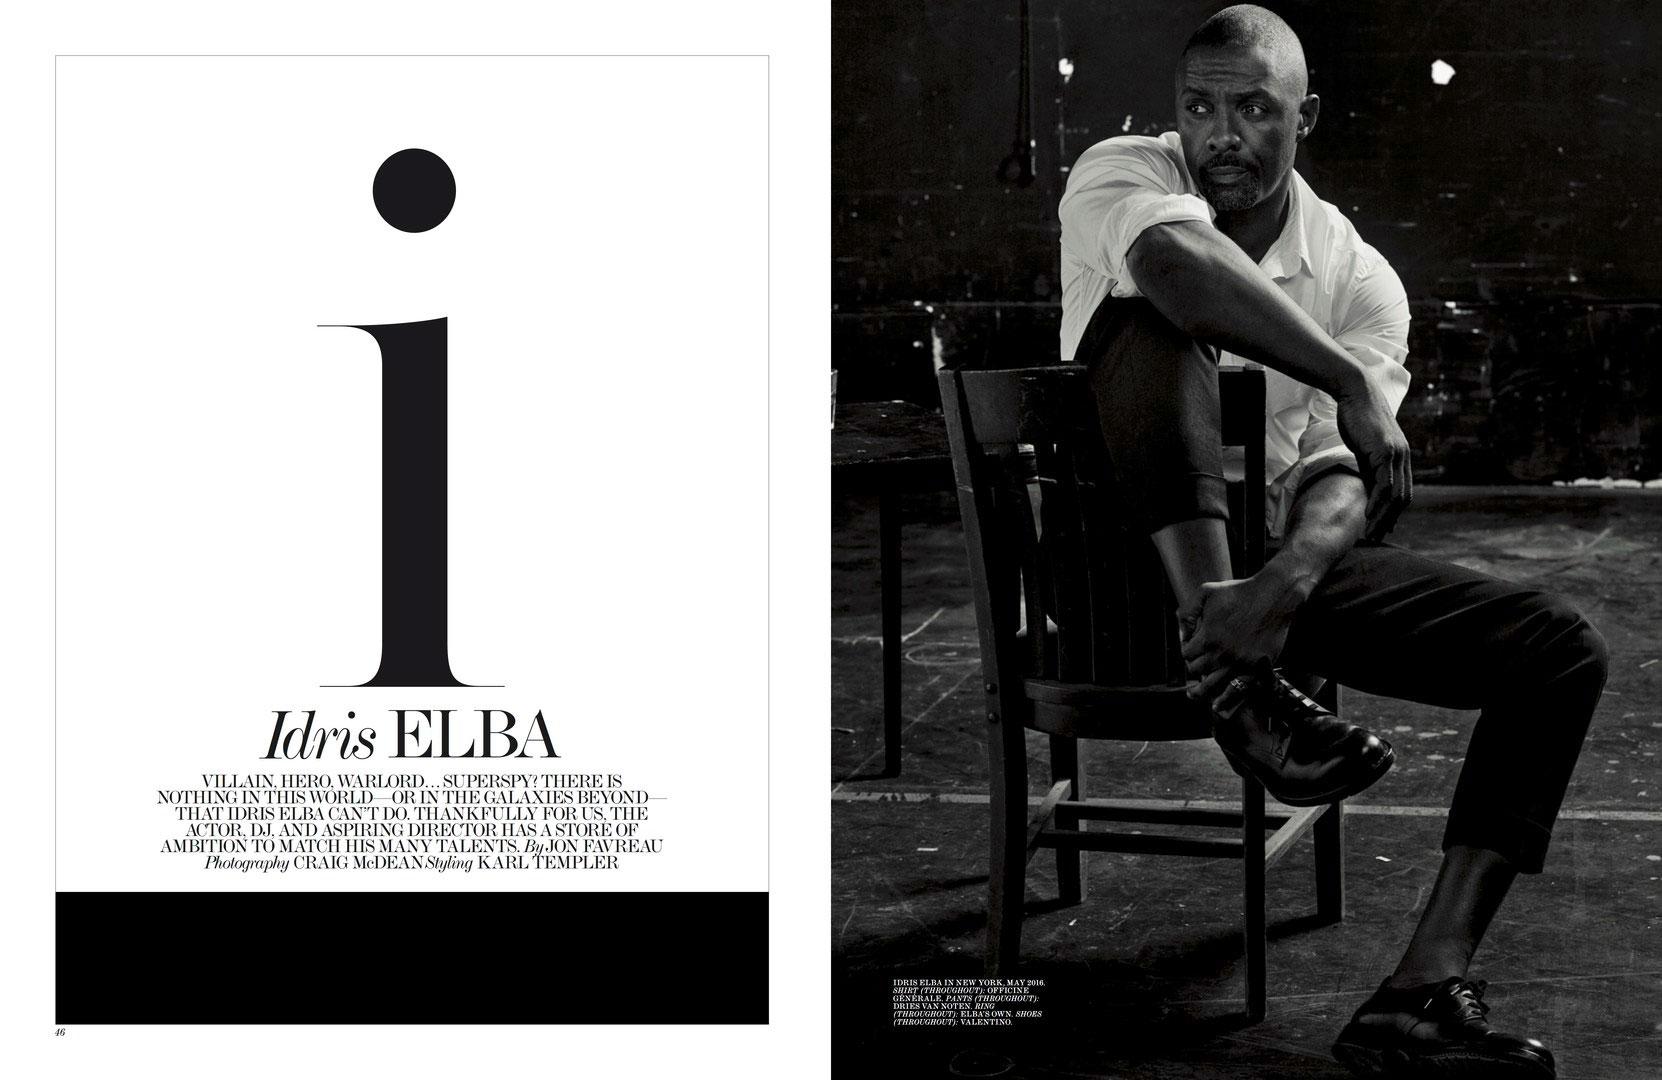 Idris-Elba-8